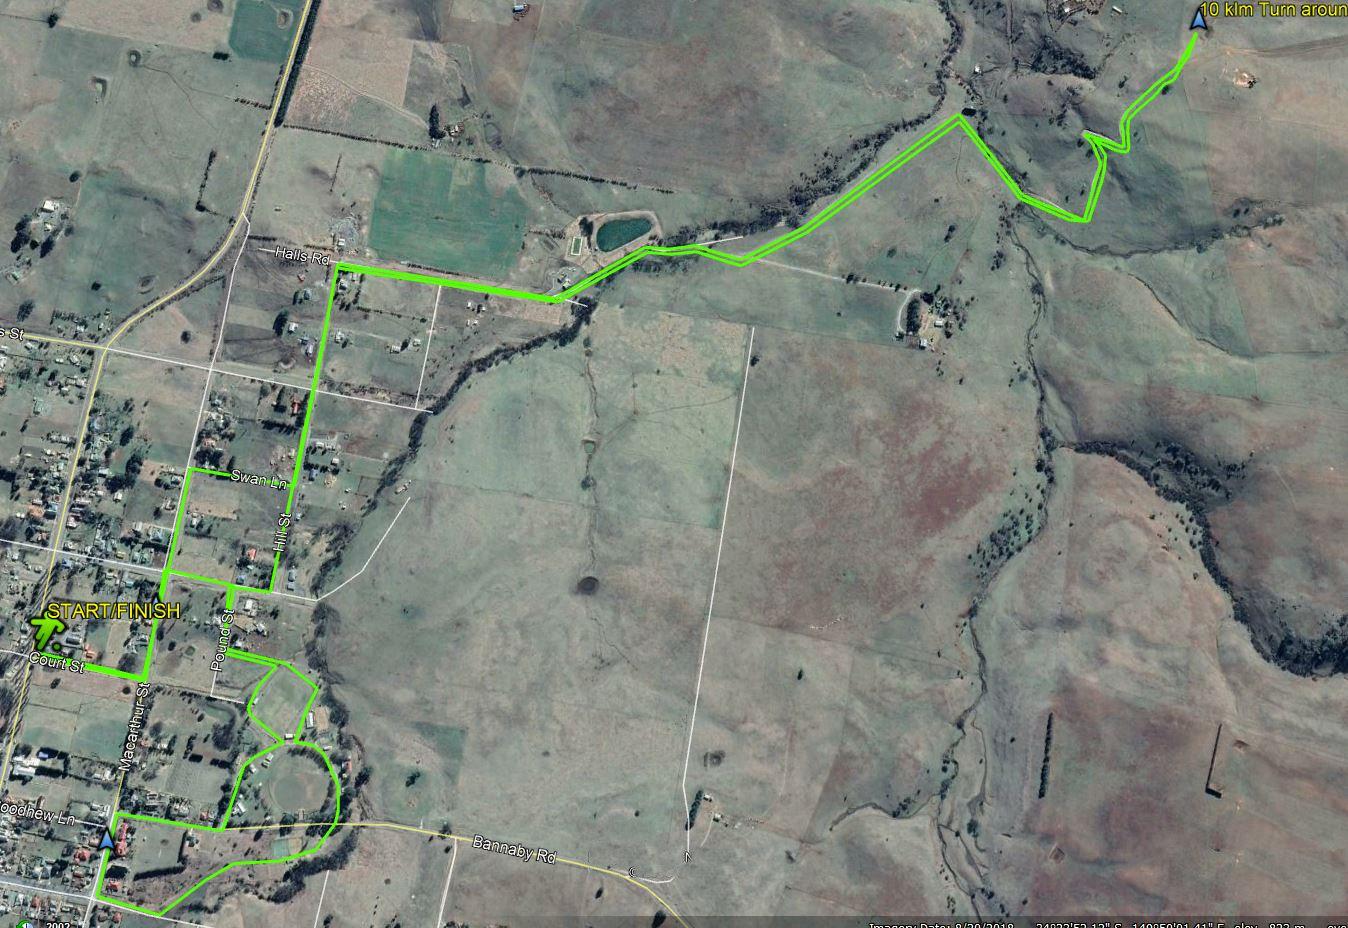 The 10klm Taralga Spring Fun Run will start and finish in Court Street